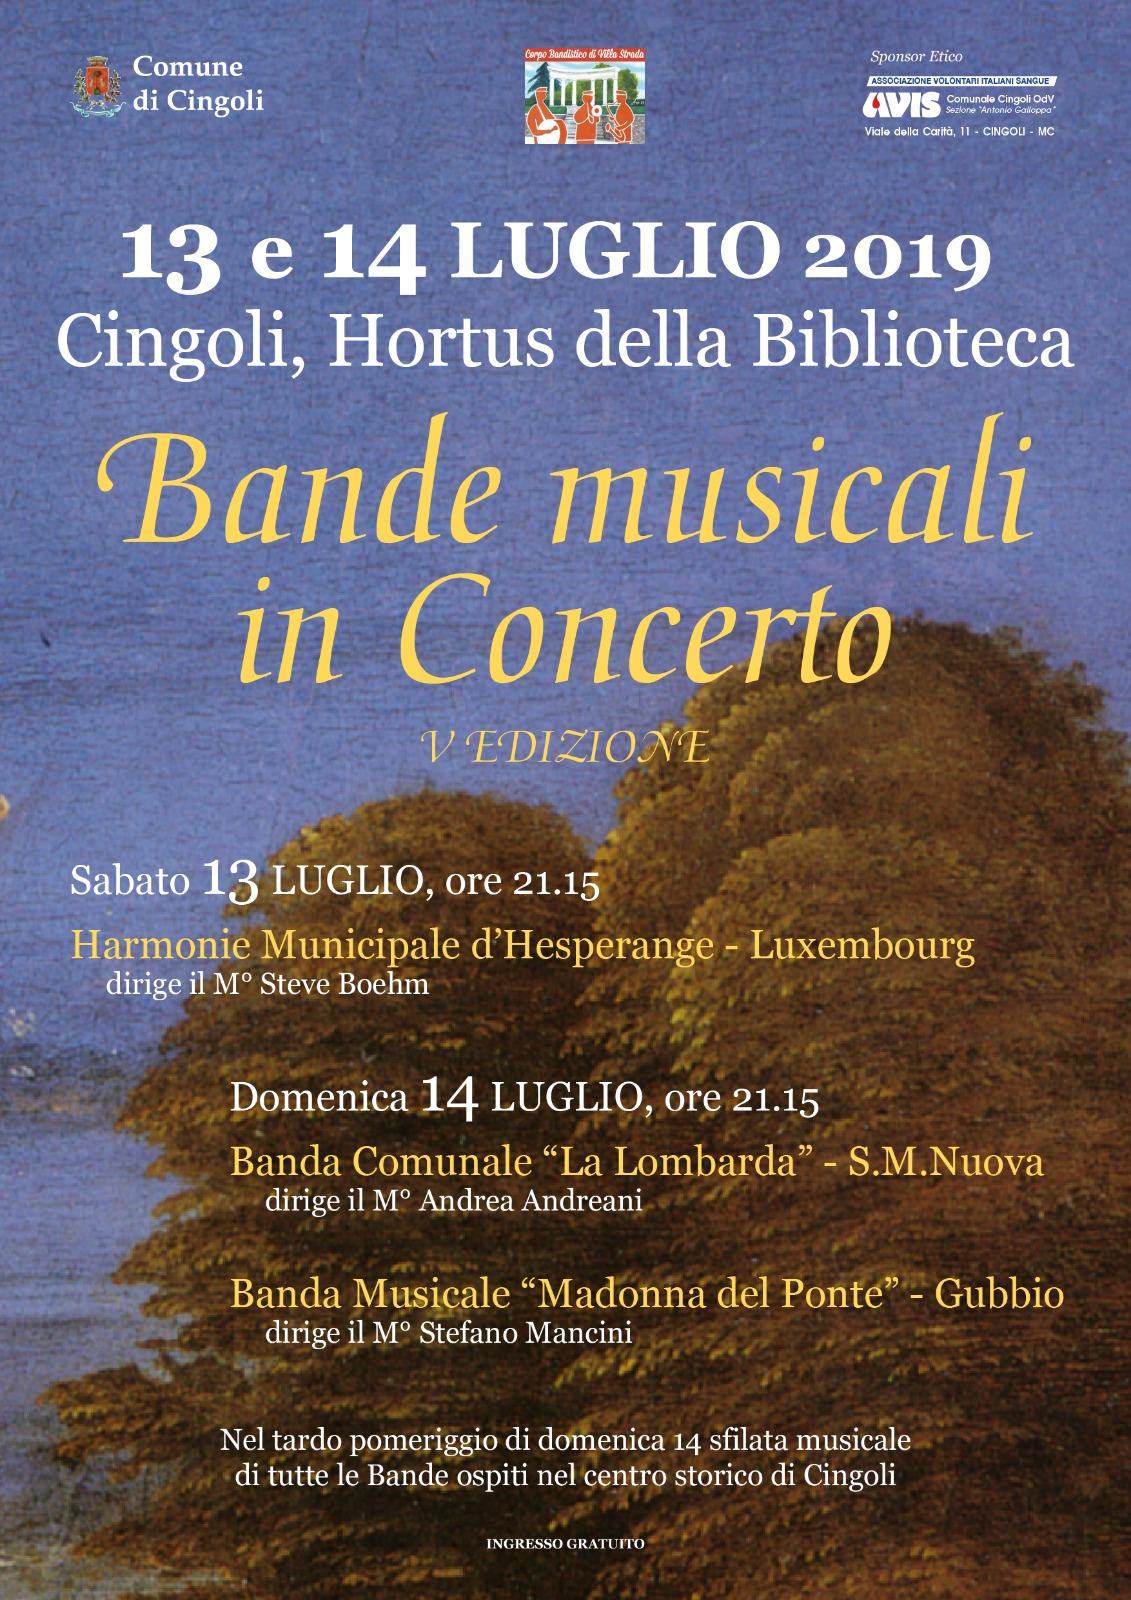 Eröffnung vum Festival Bande Musicale in Concerto zu Cingoli